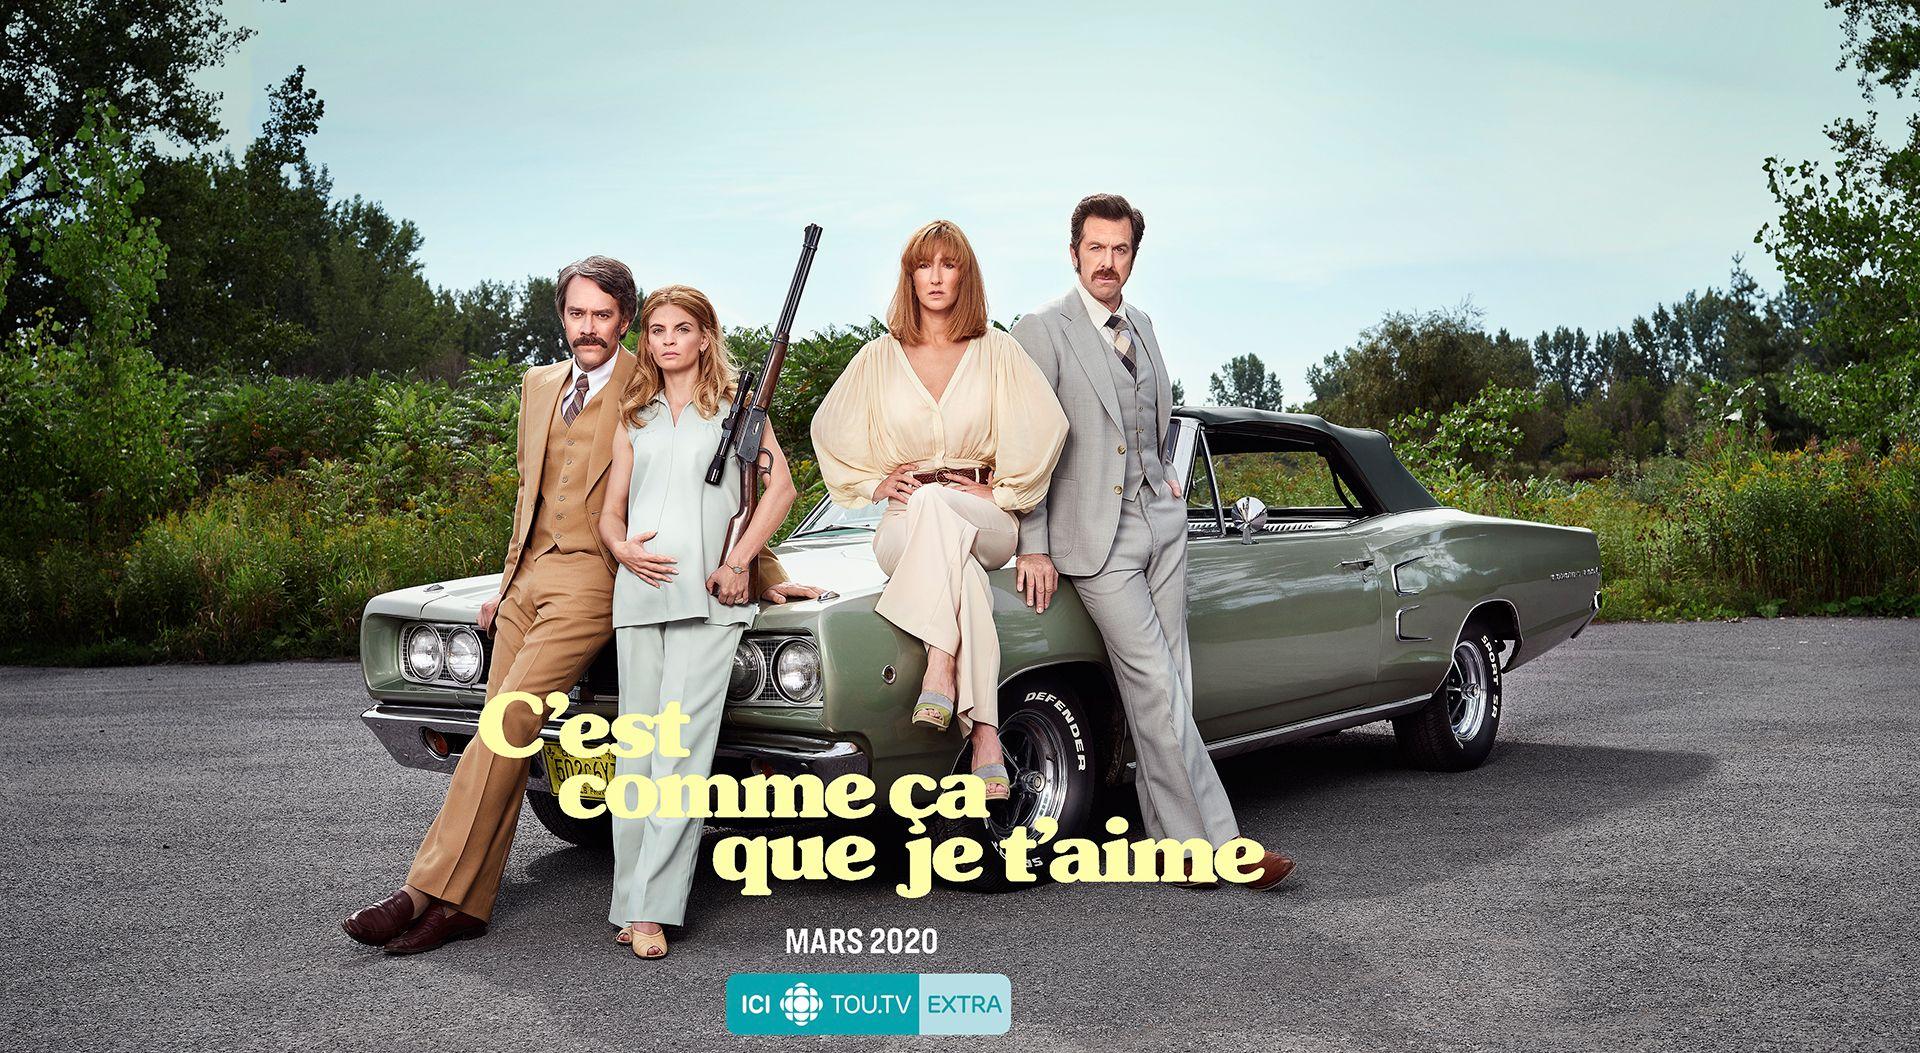 C'est comme ça que je t'aime TV show poster by Jocelyn Michel for Radio-Canada